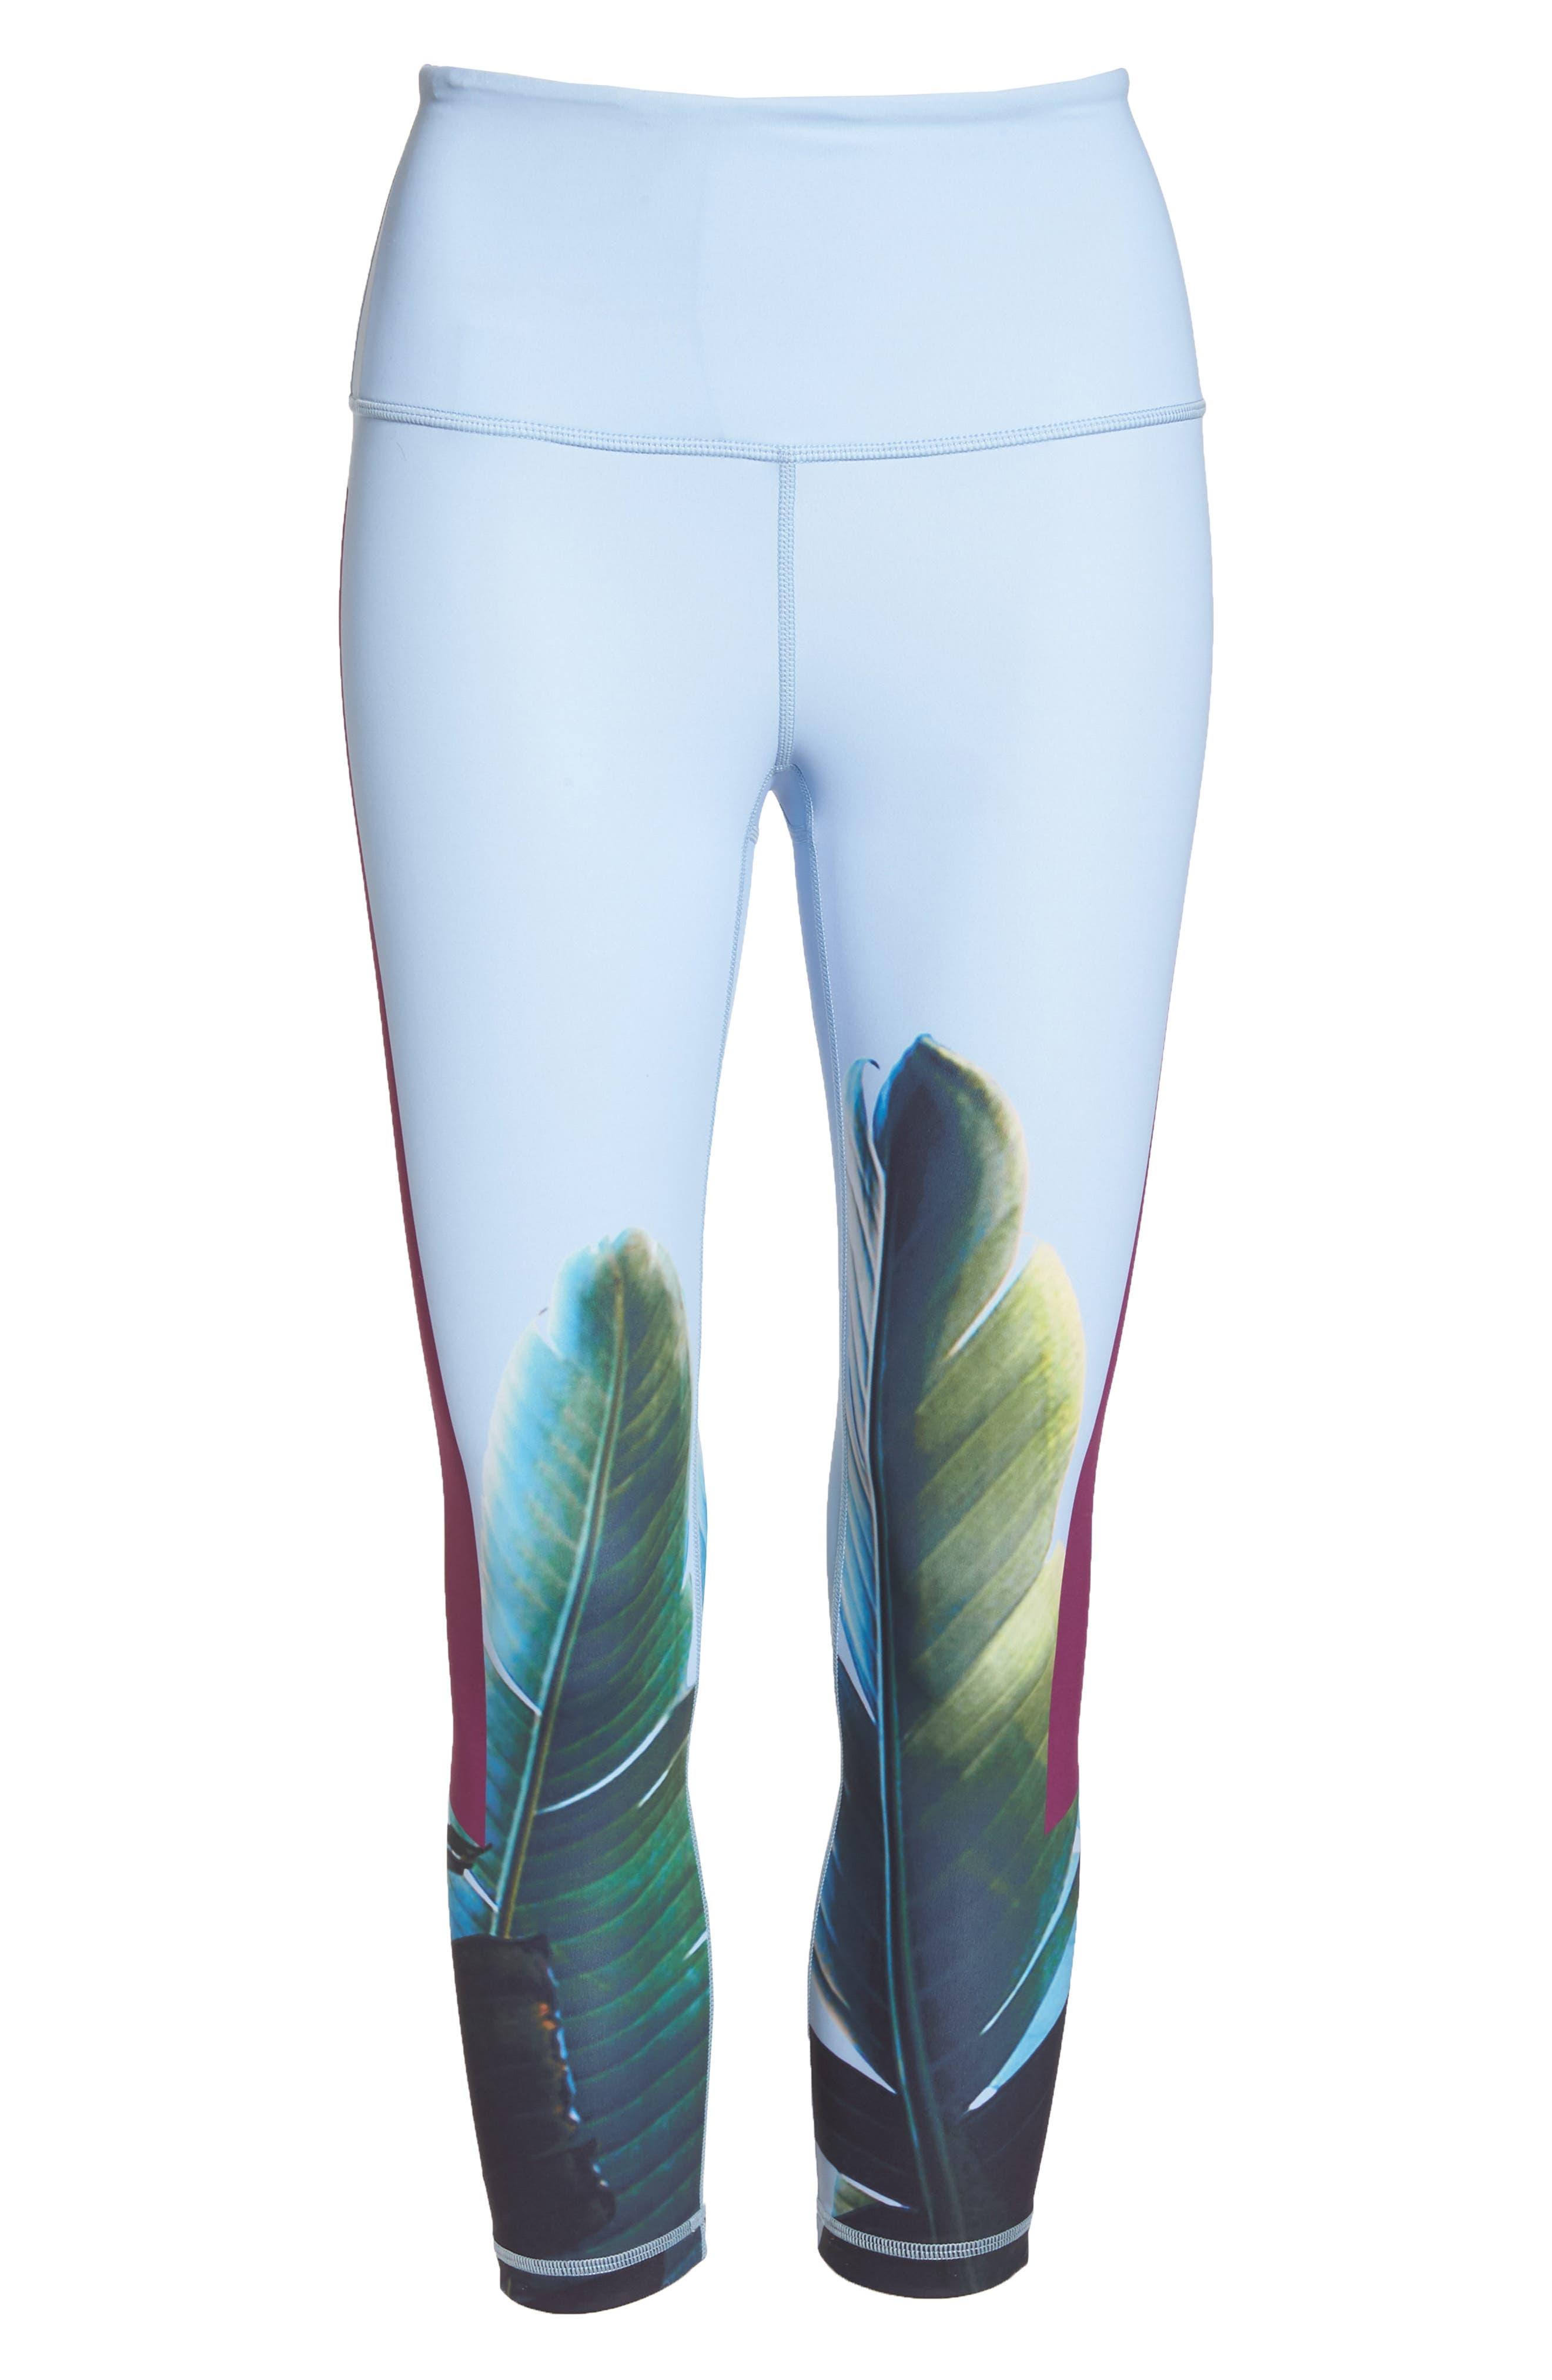 Pure Vision High Waist Crop Leggings,                             Alternate thumbnail 4, color,                             Blue Kentucky Under Palms Prt